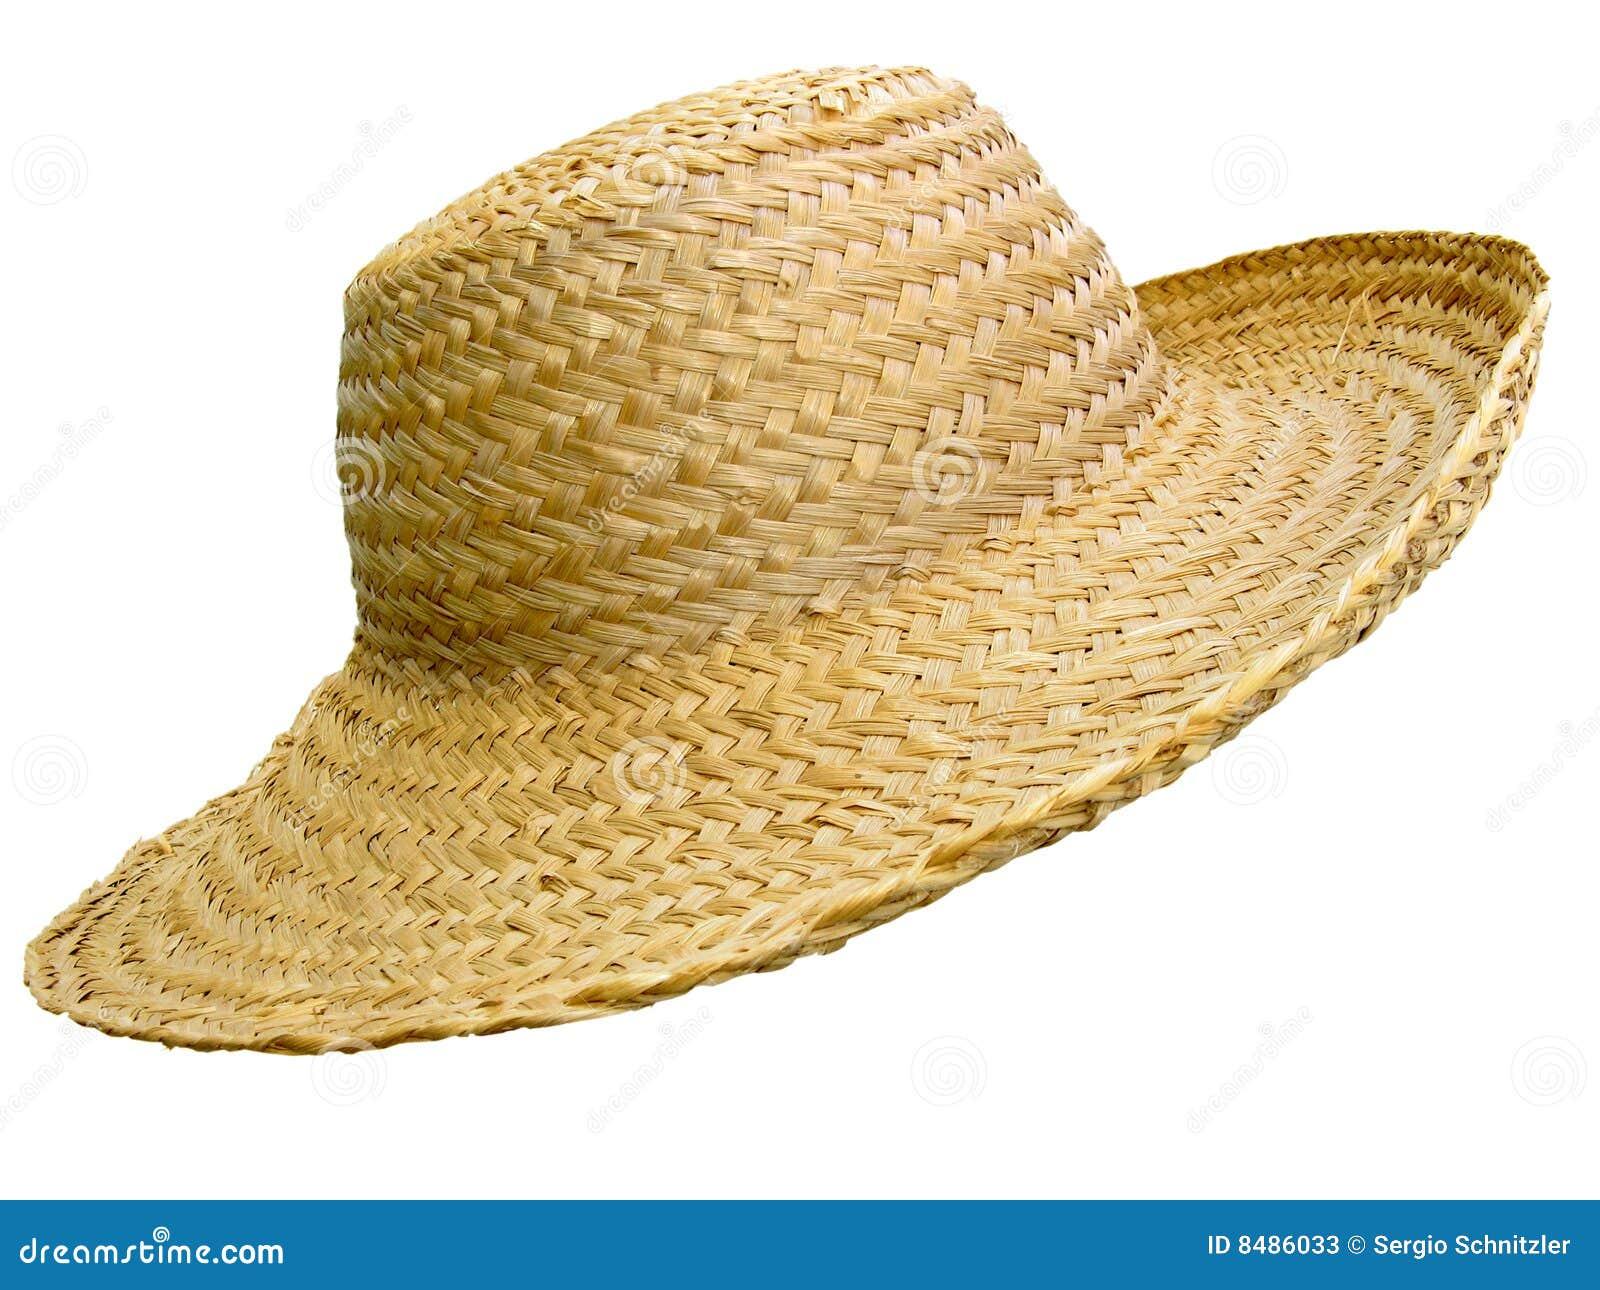 Sombrero de paja hecho a mano